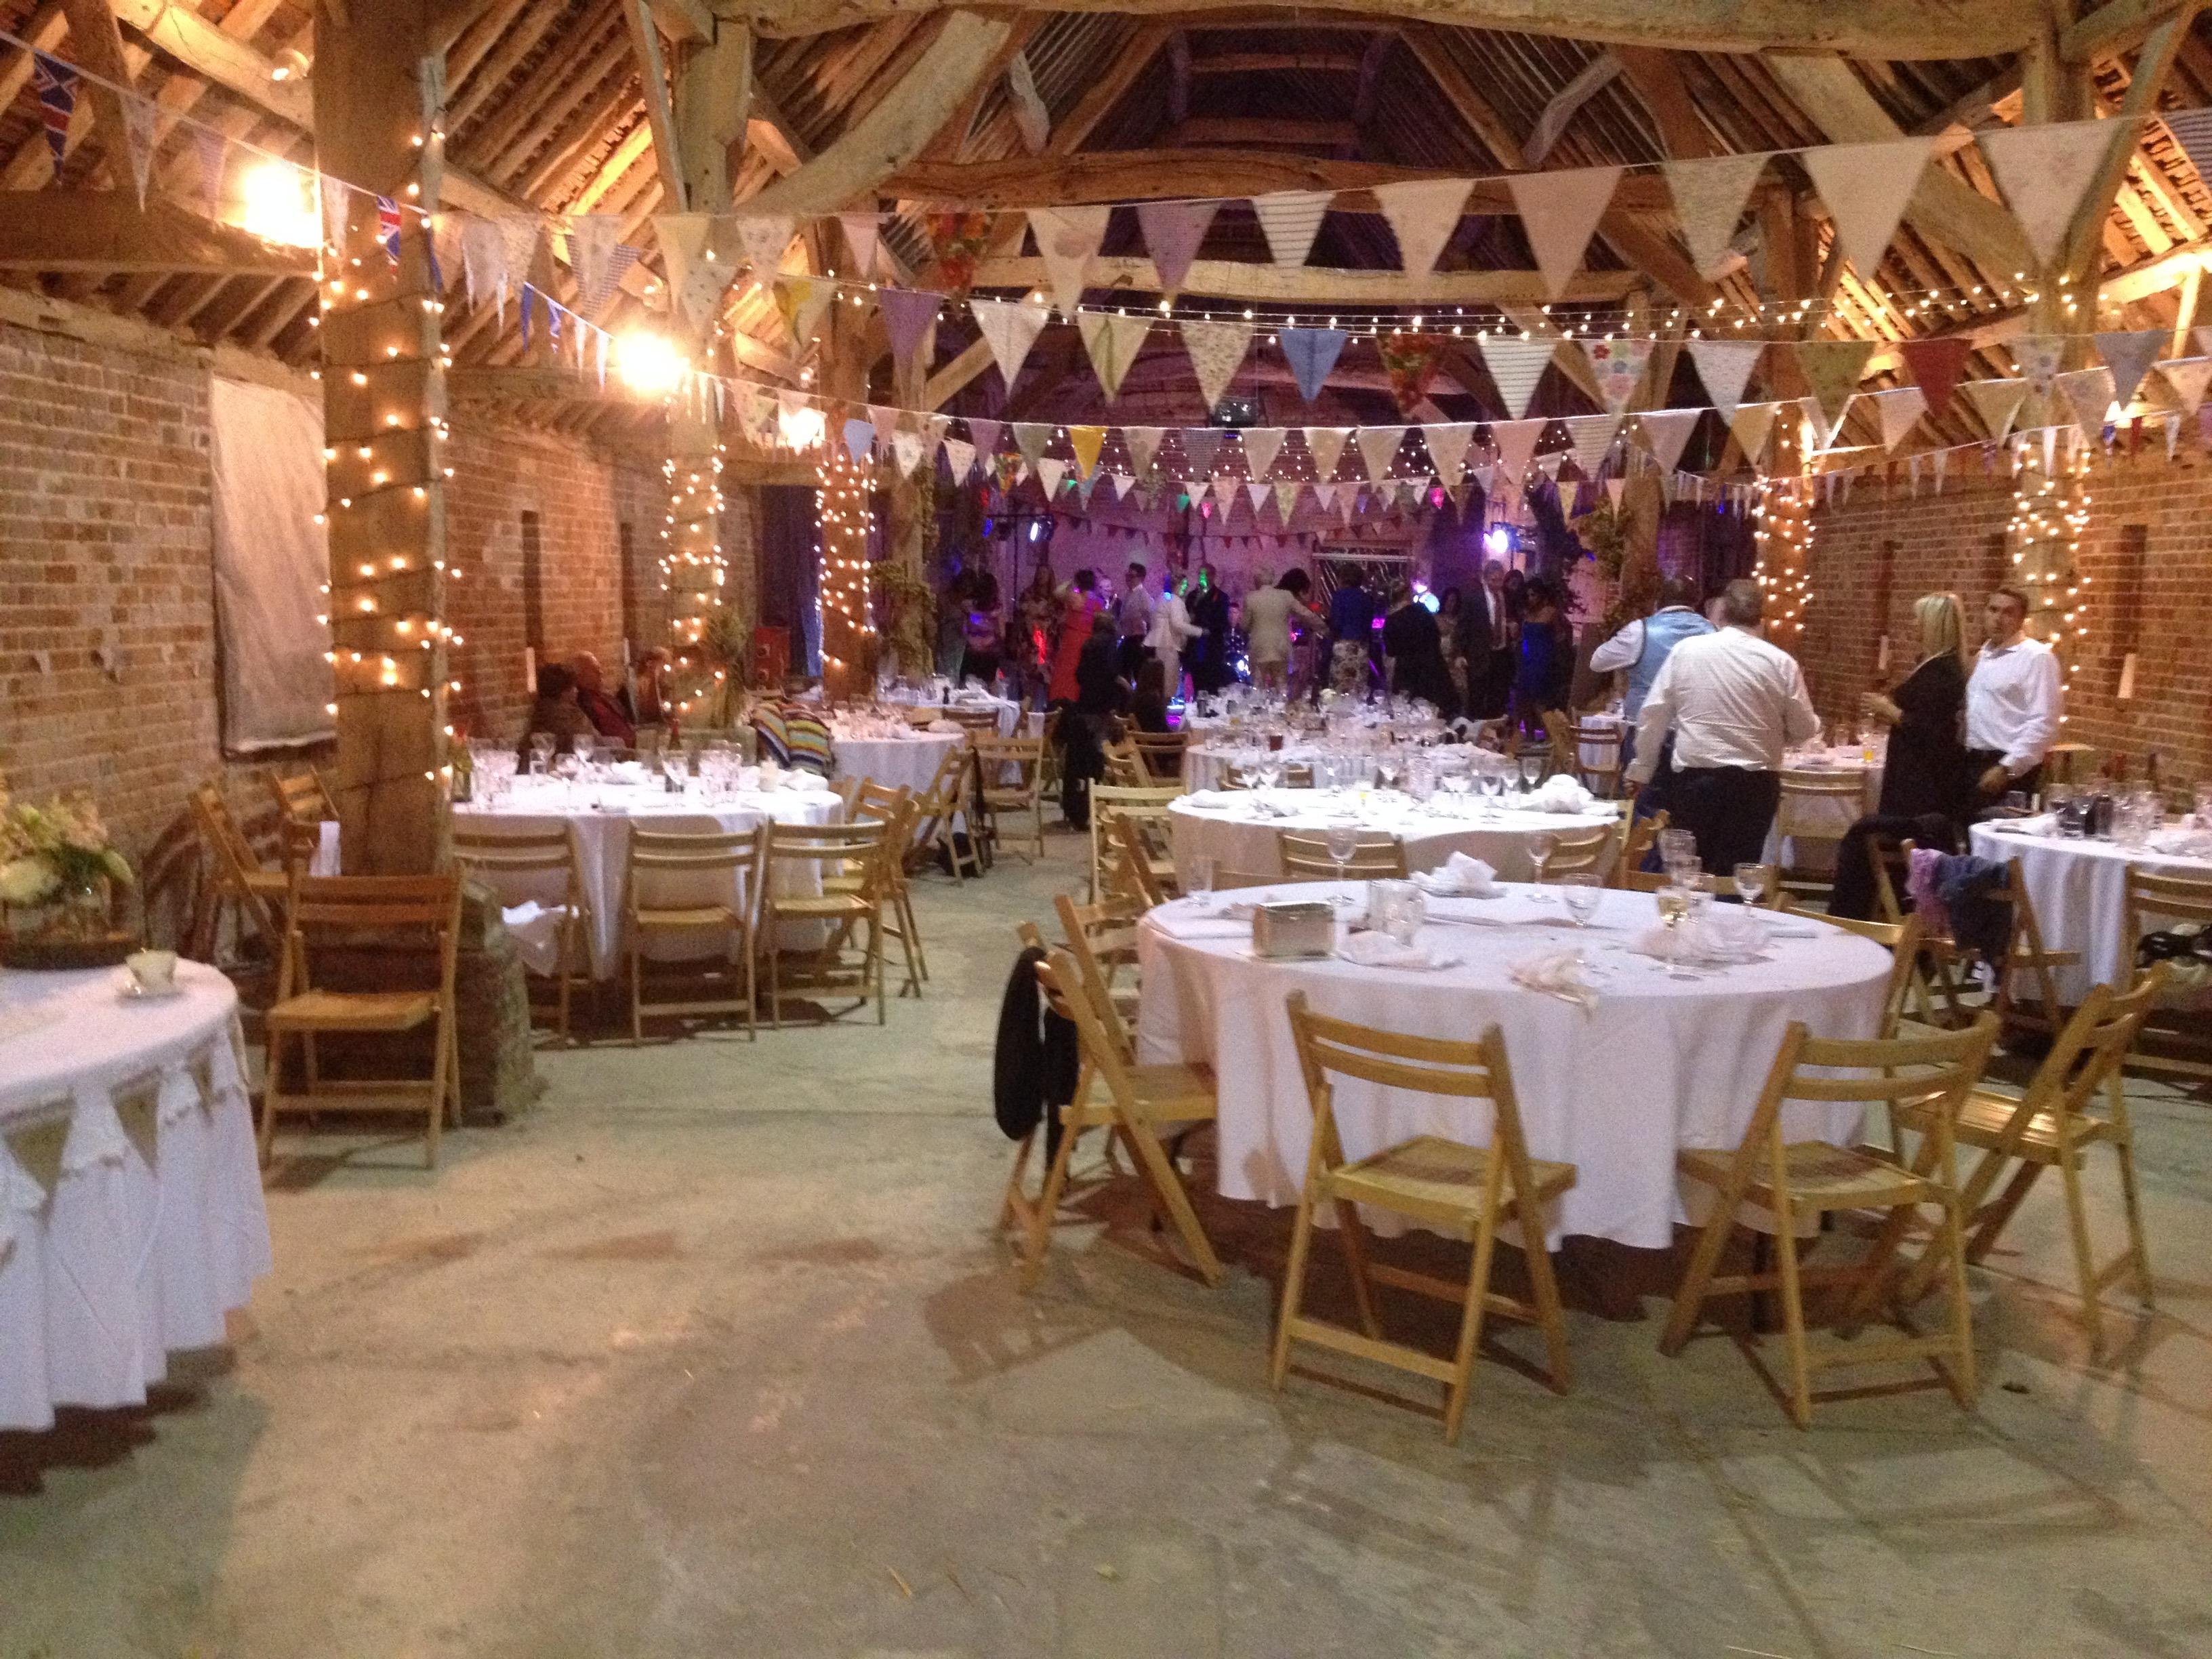 vintage barn with wedding bunting